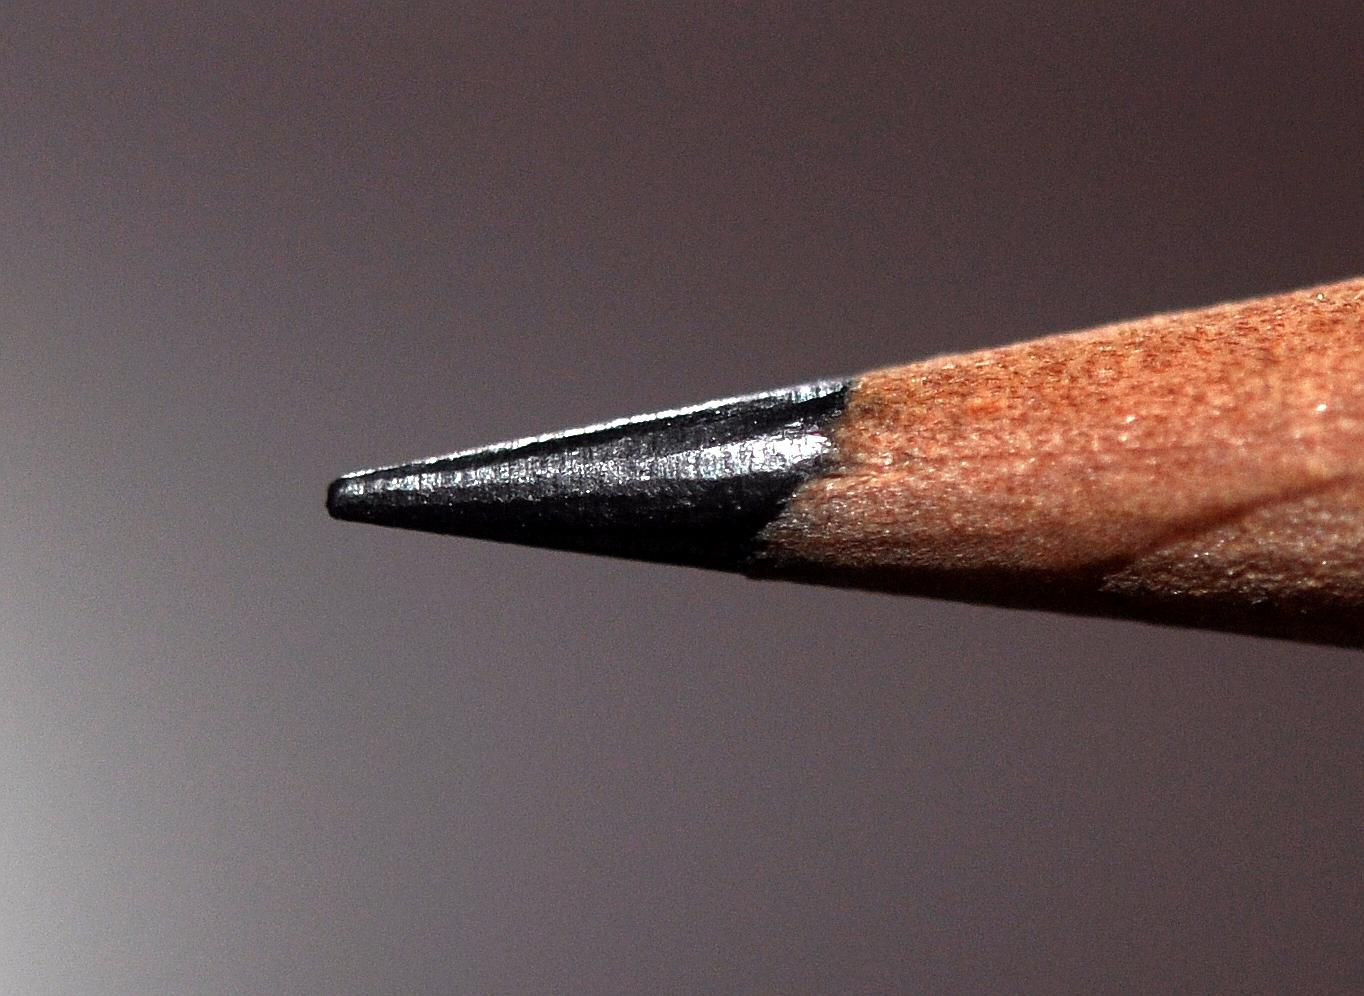 File:Closeup of pencil graphite.JPG - Wikimedia Commons